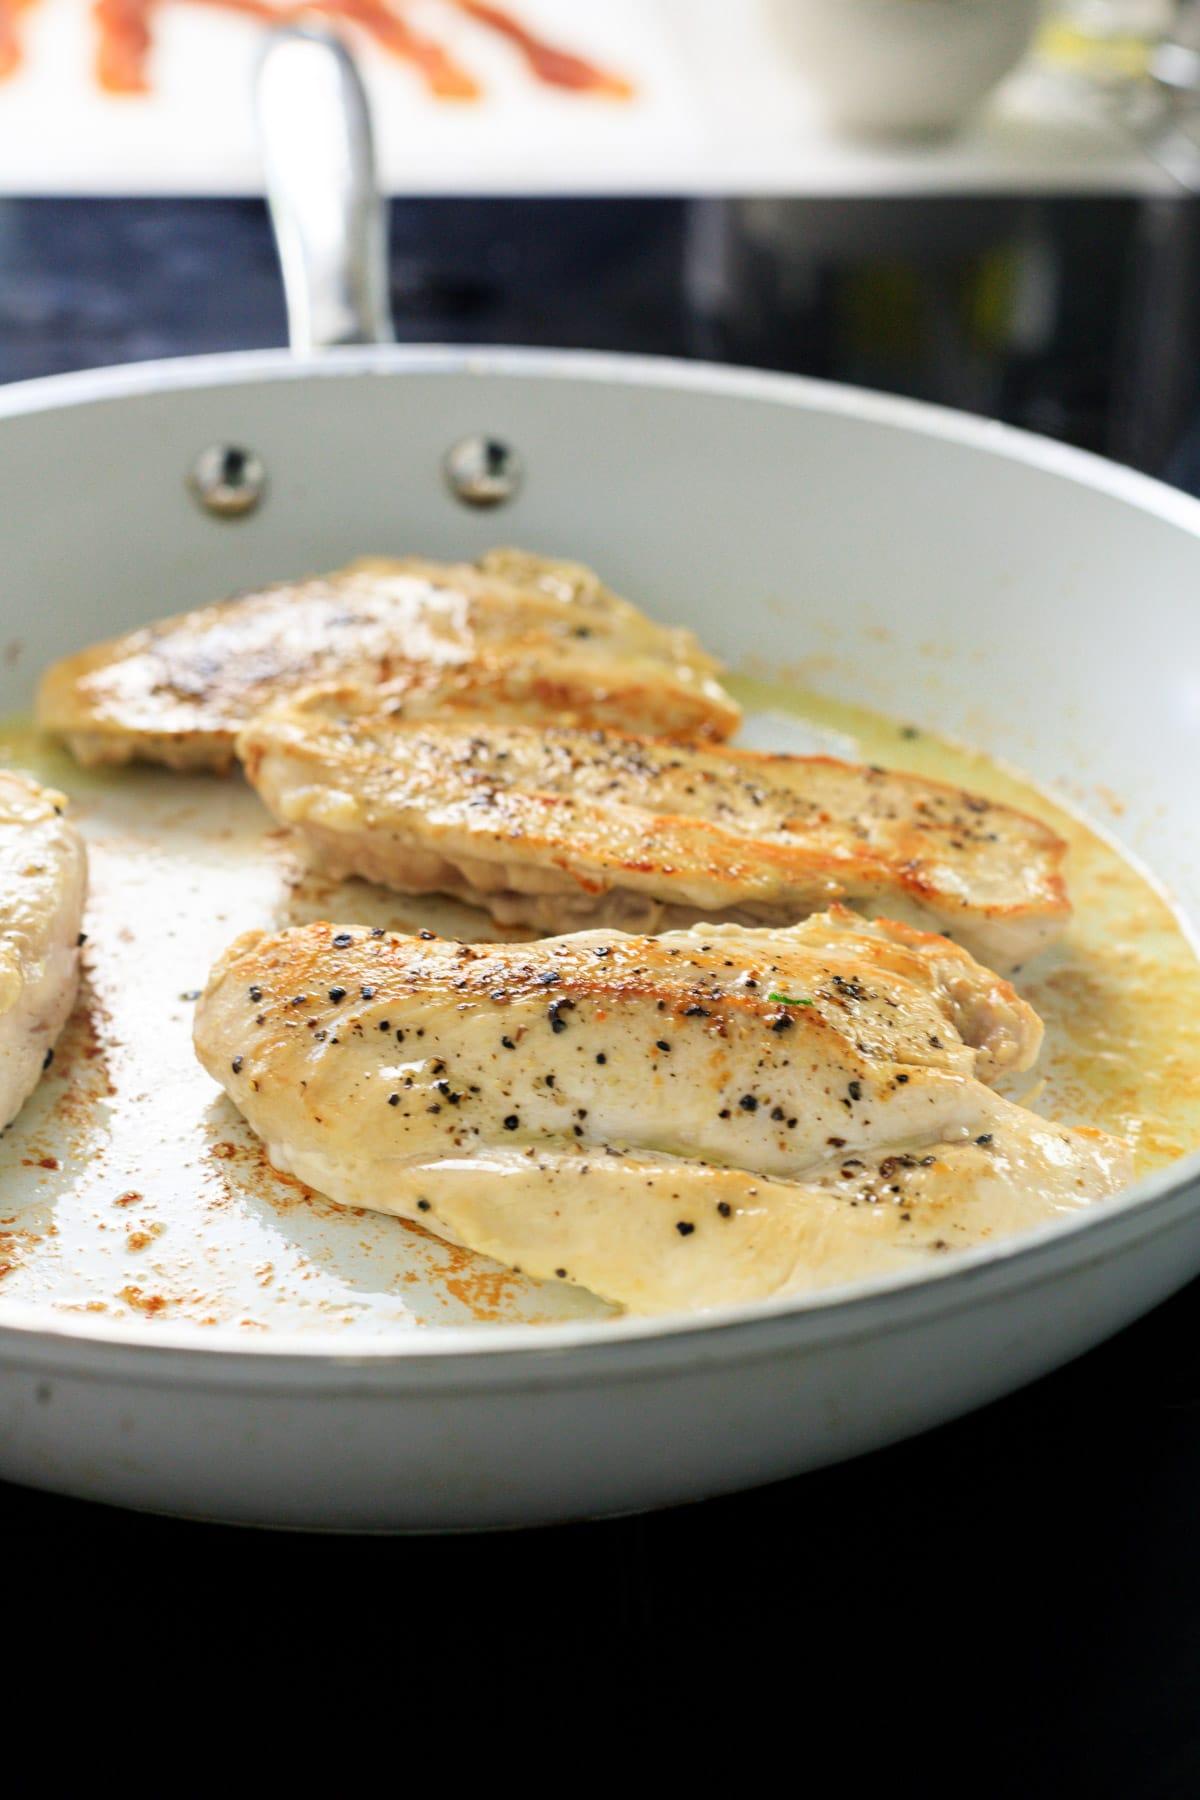 Seasoned chicken breasts frying in a skillet.